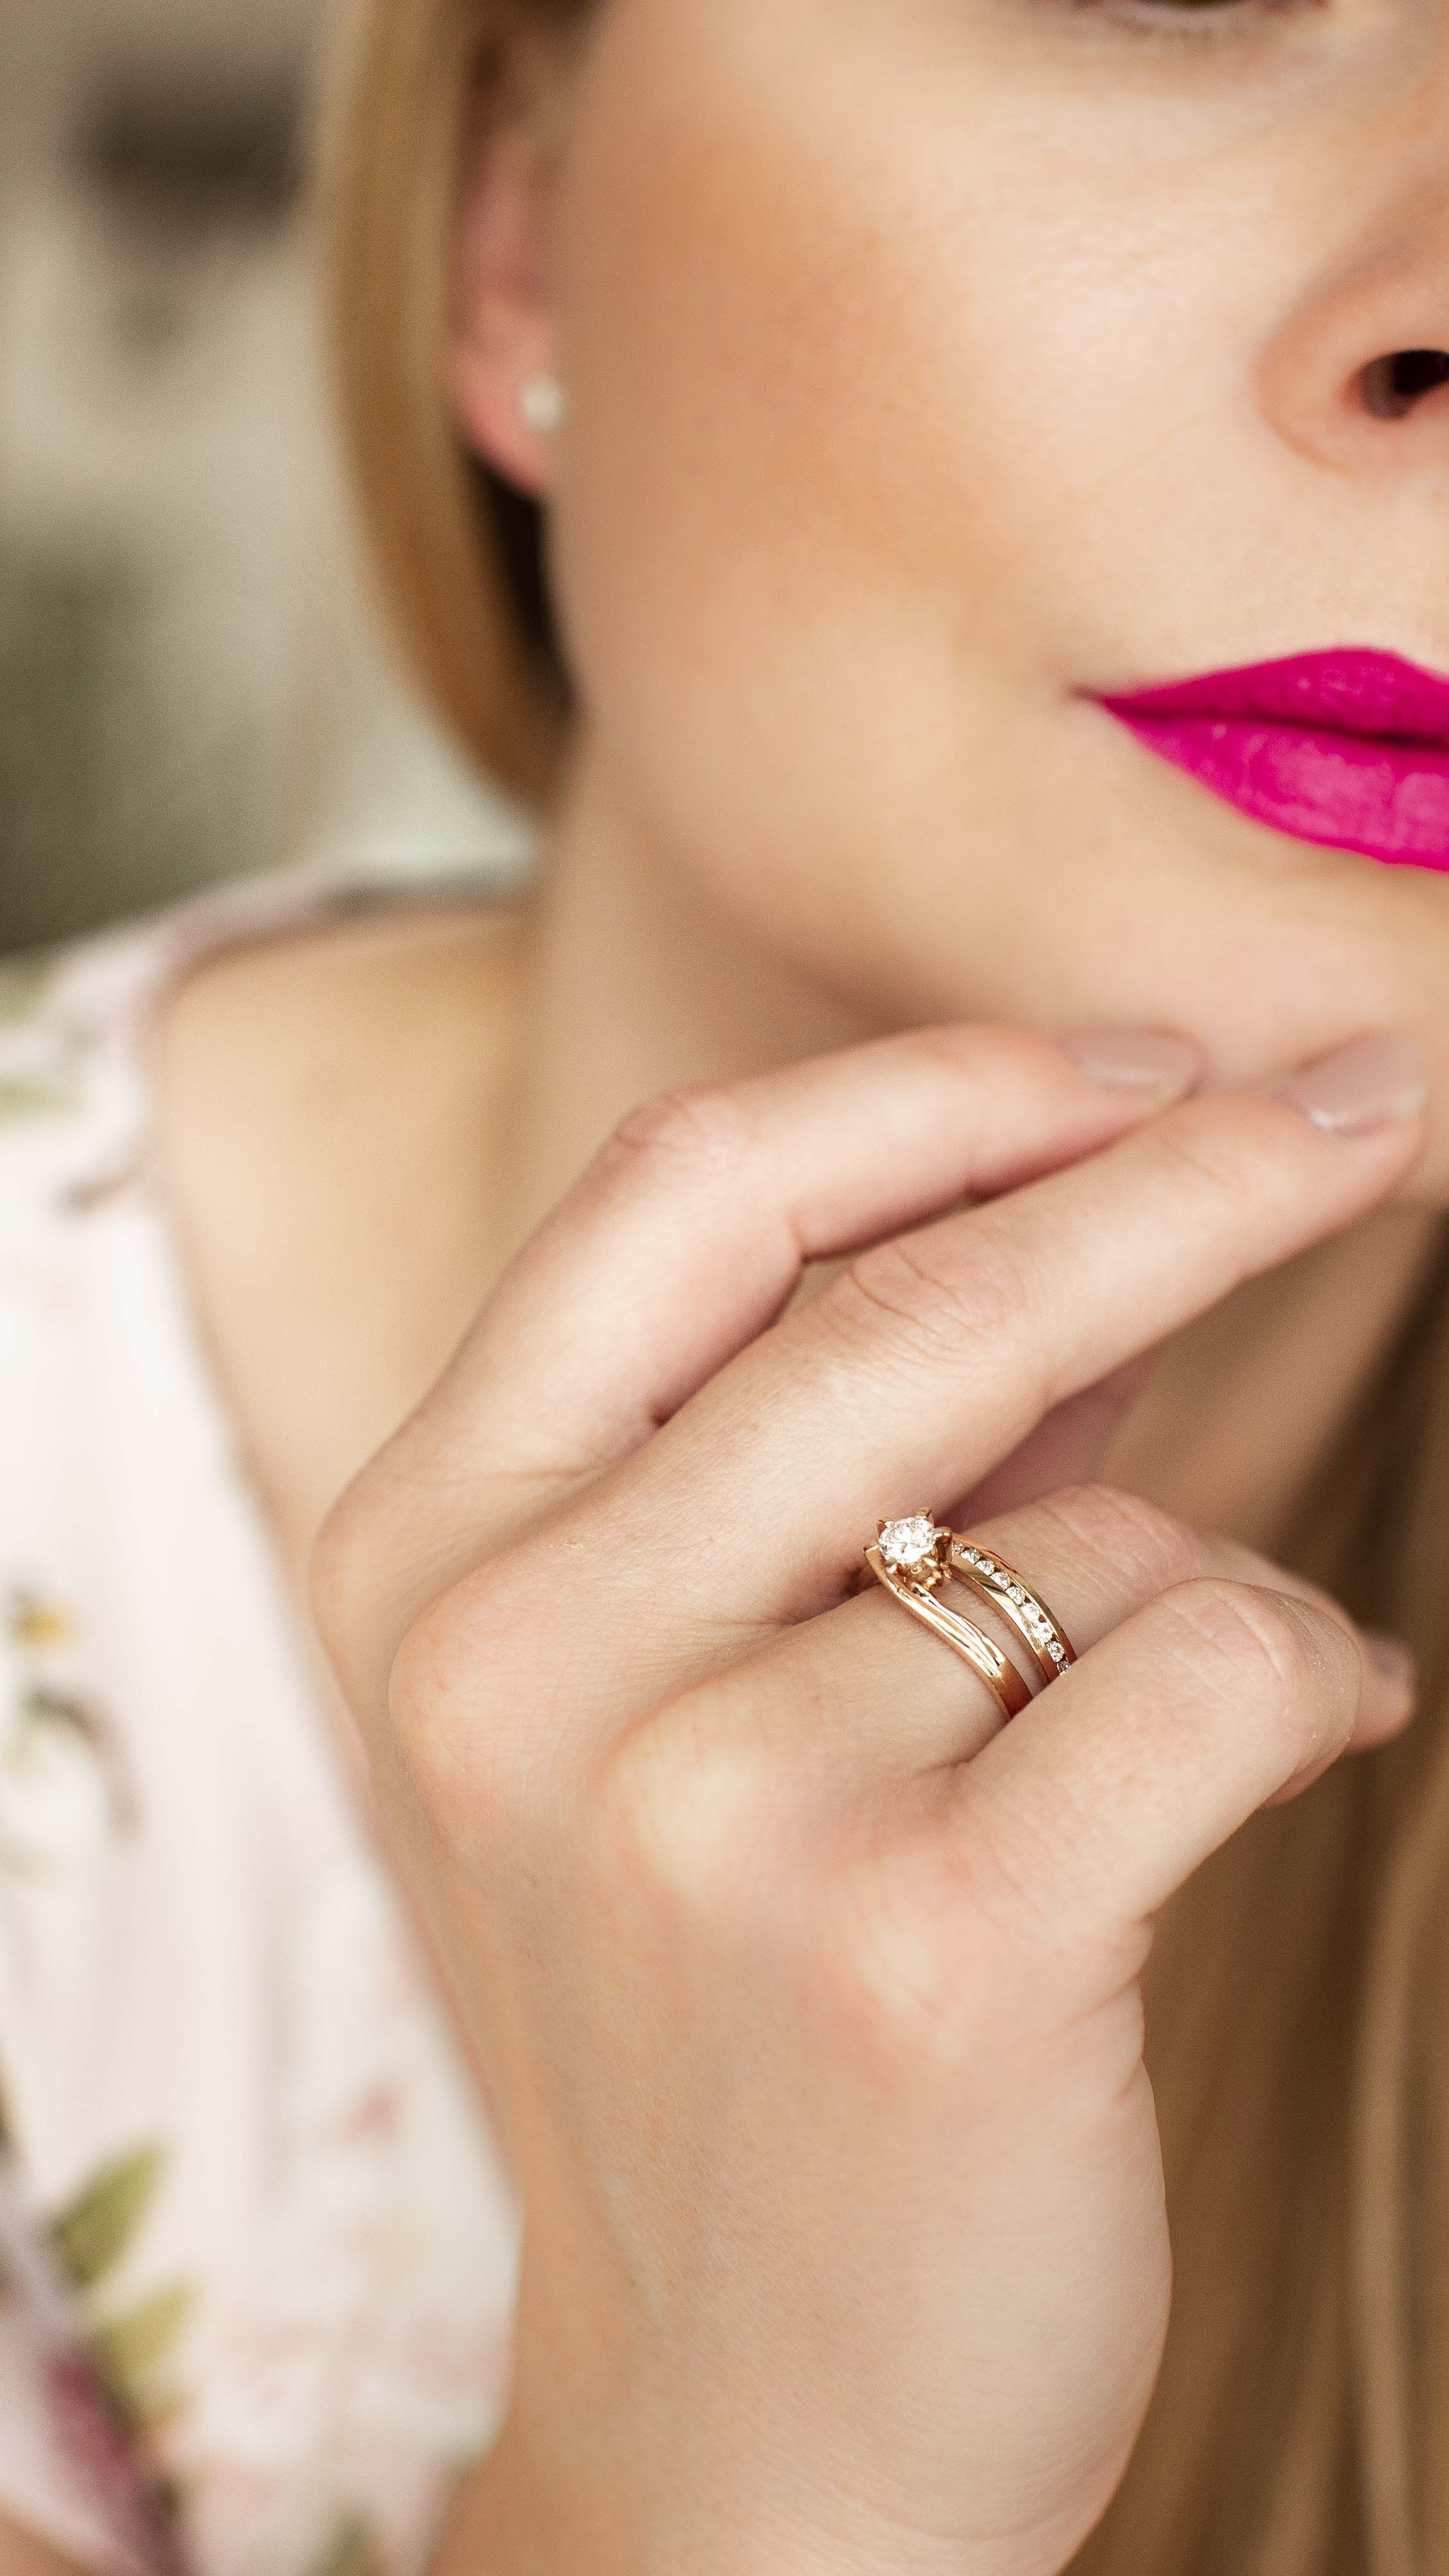 Verlobungsring Rosegold Ring Verlobung Verlobungsring Verlobung